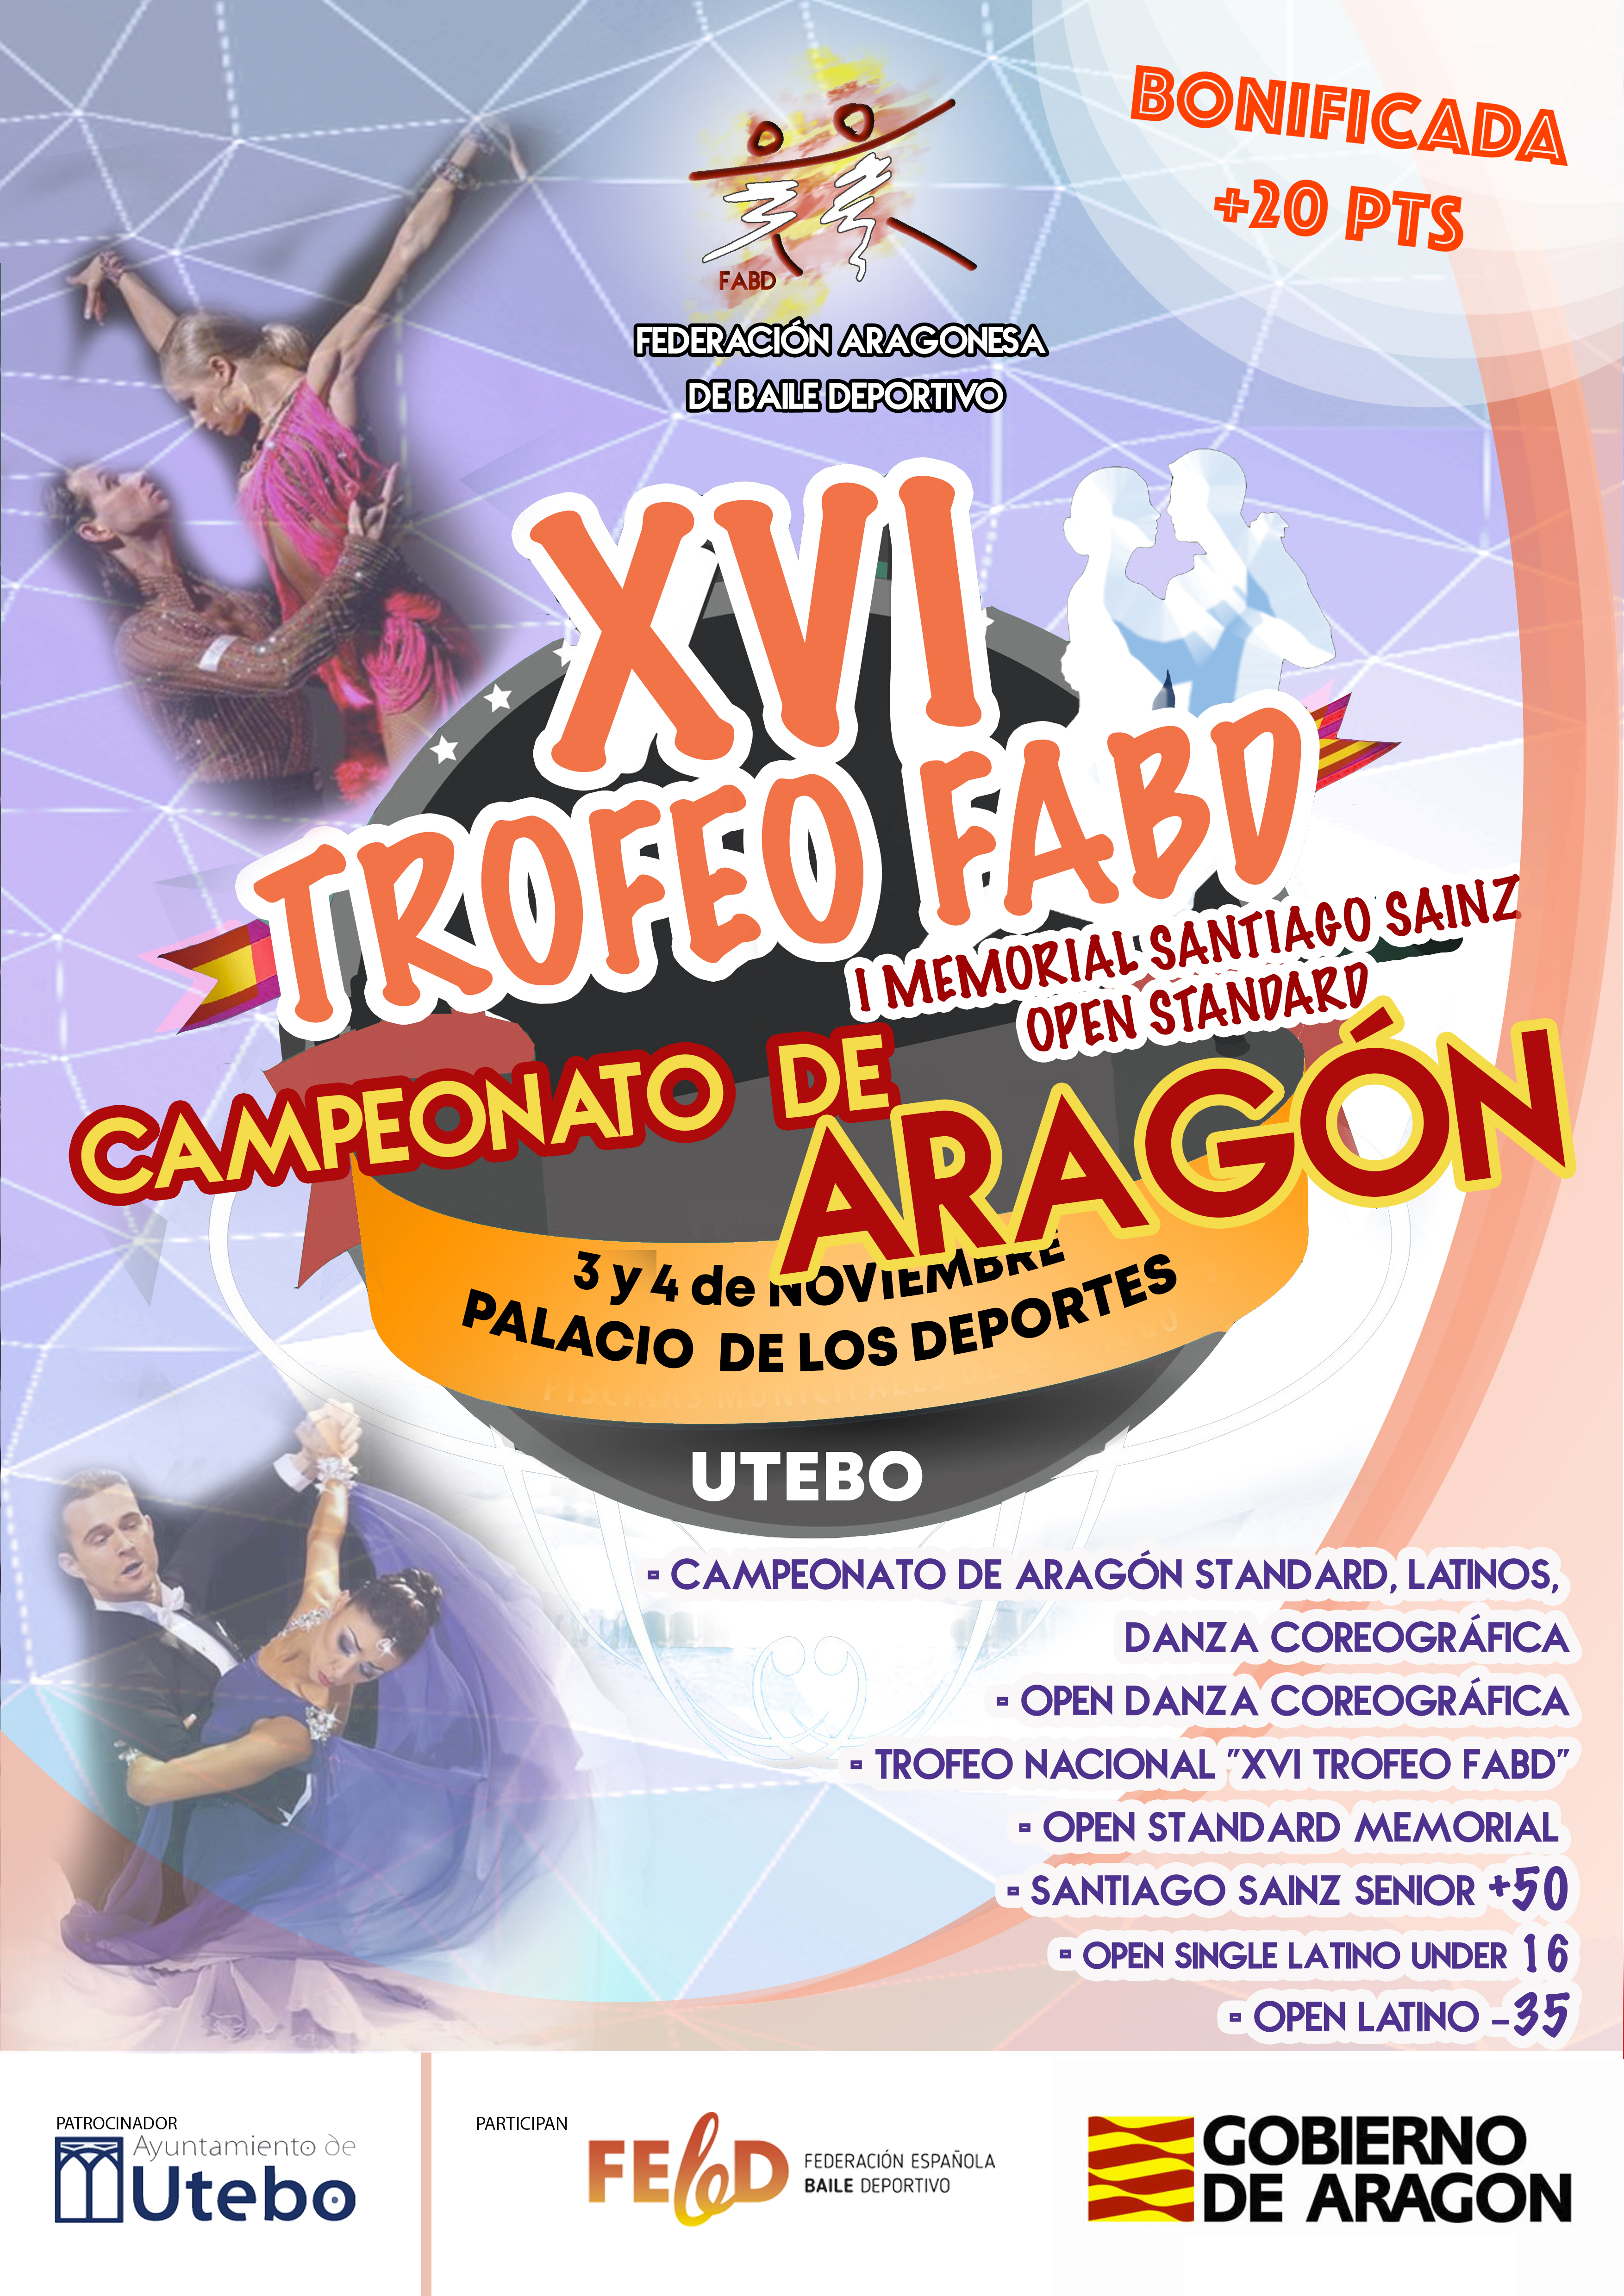 CAMPEONATO DE ARAGON - XVI TROFEO FABD - MEMORIAL SANTIAGO SAINZ